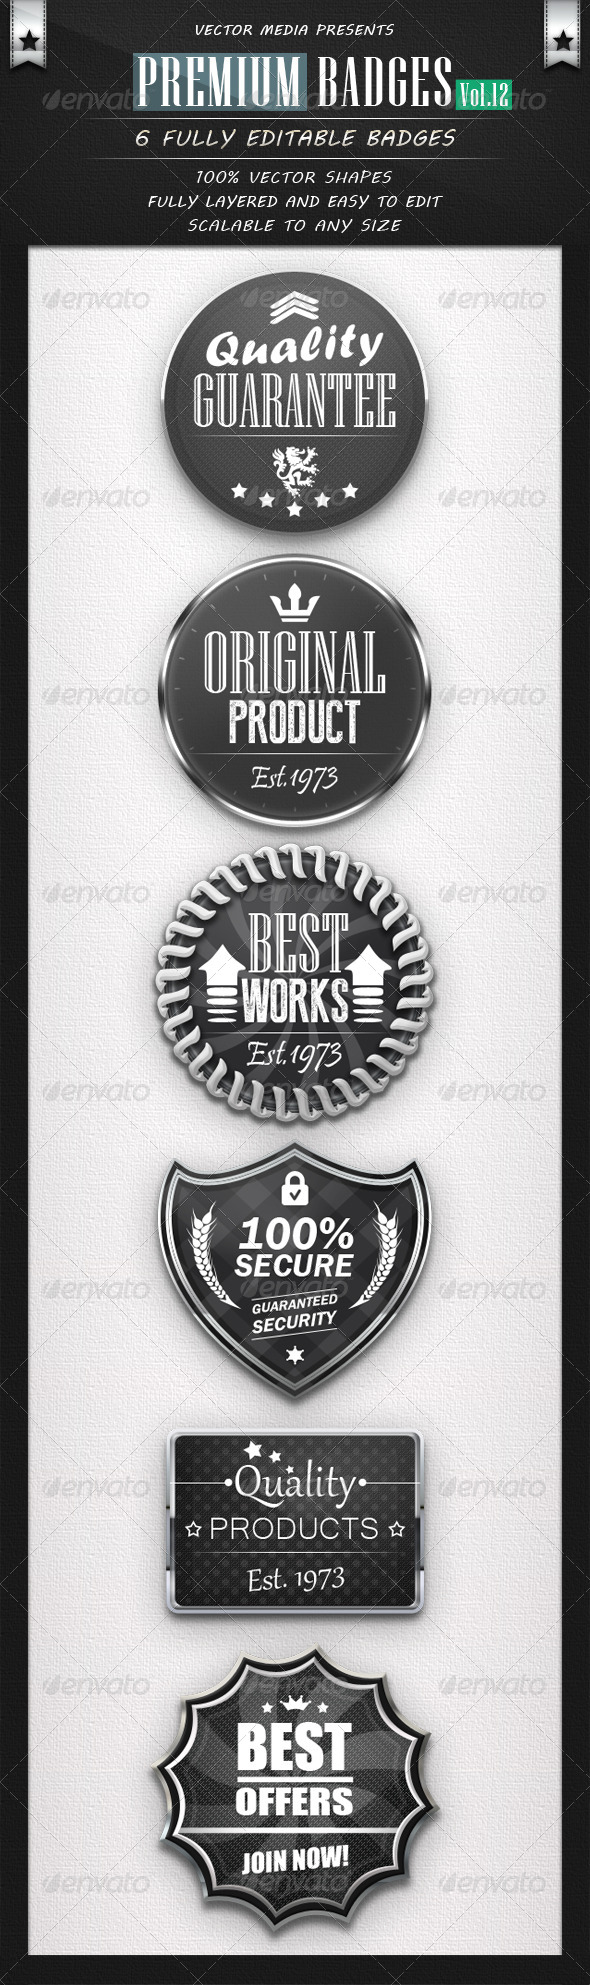 Premium Badges - Vol.12 - Badges & Stickers Web Elements